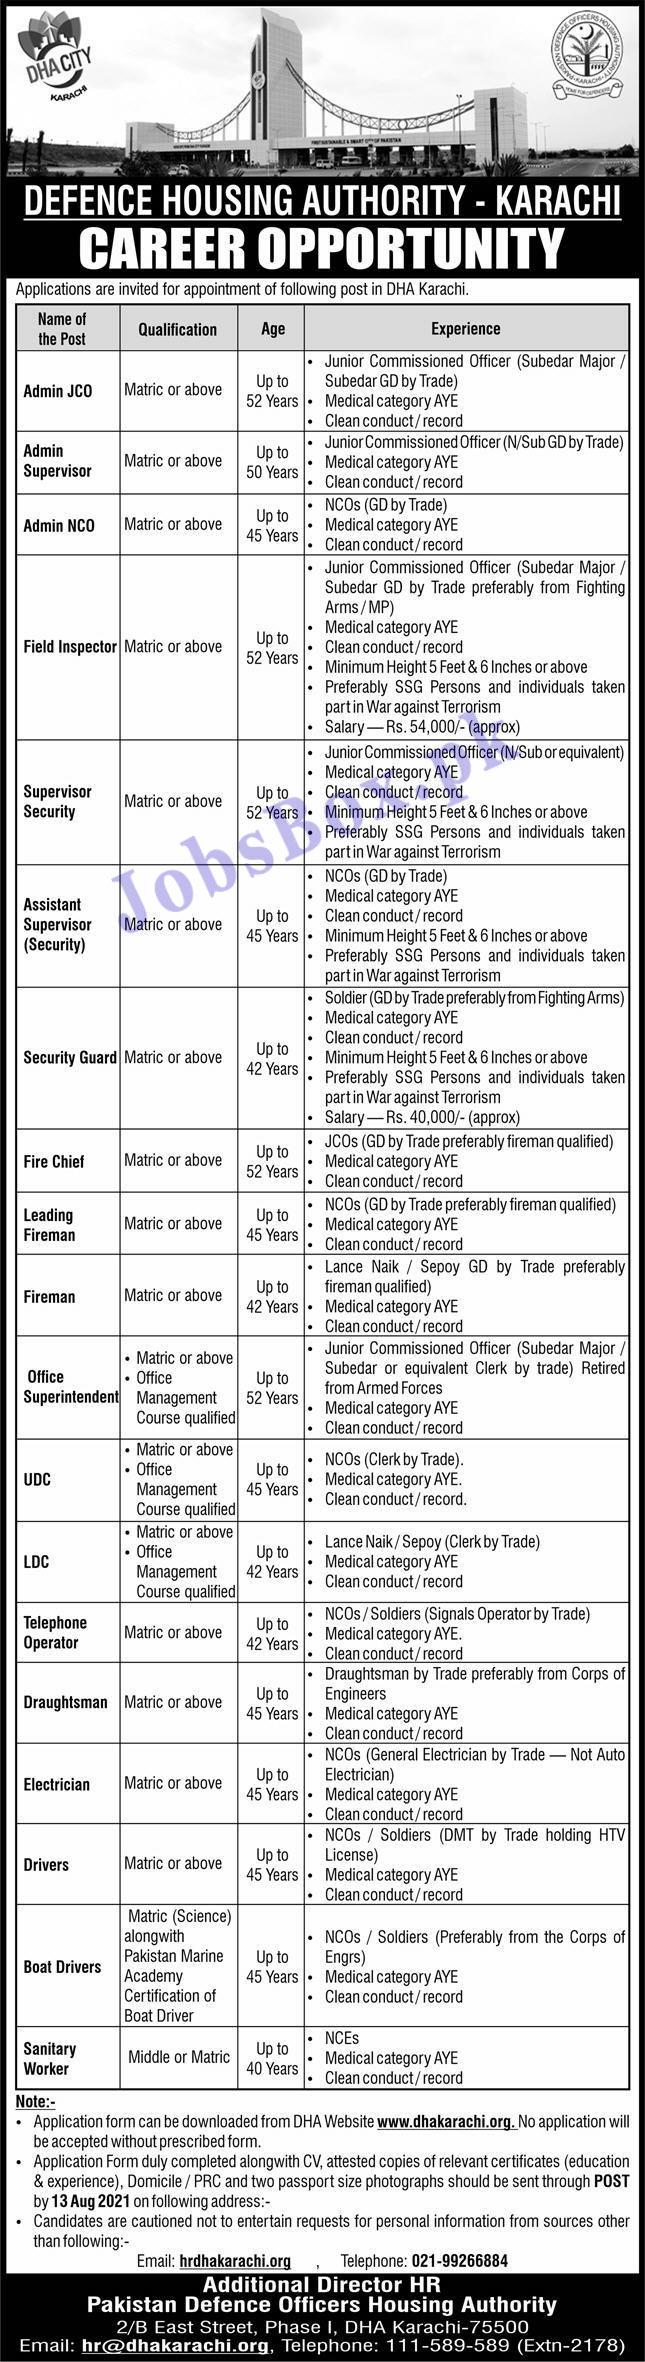 Defence Housing Authority DHA Karachi Jobs 2021 - www.dhakarachi.org